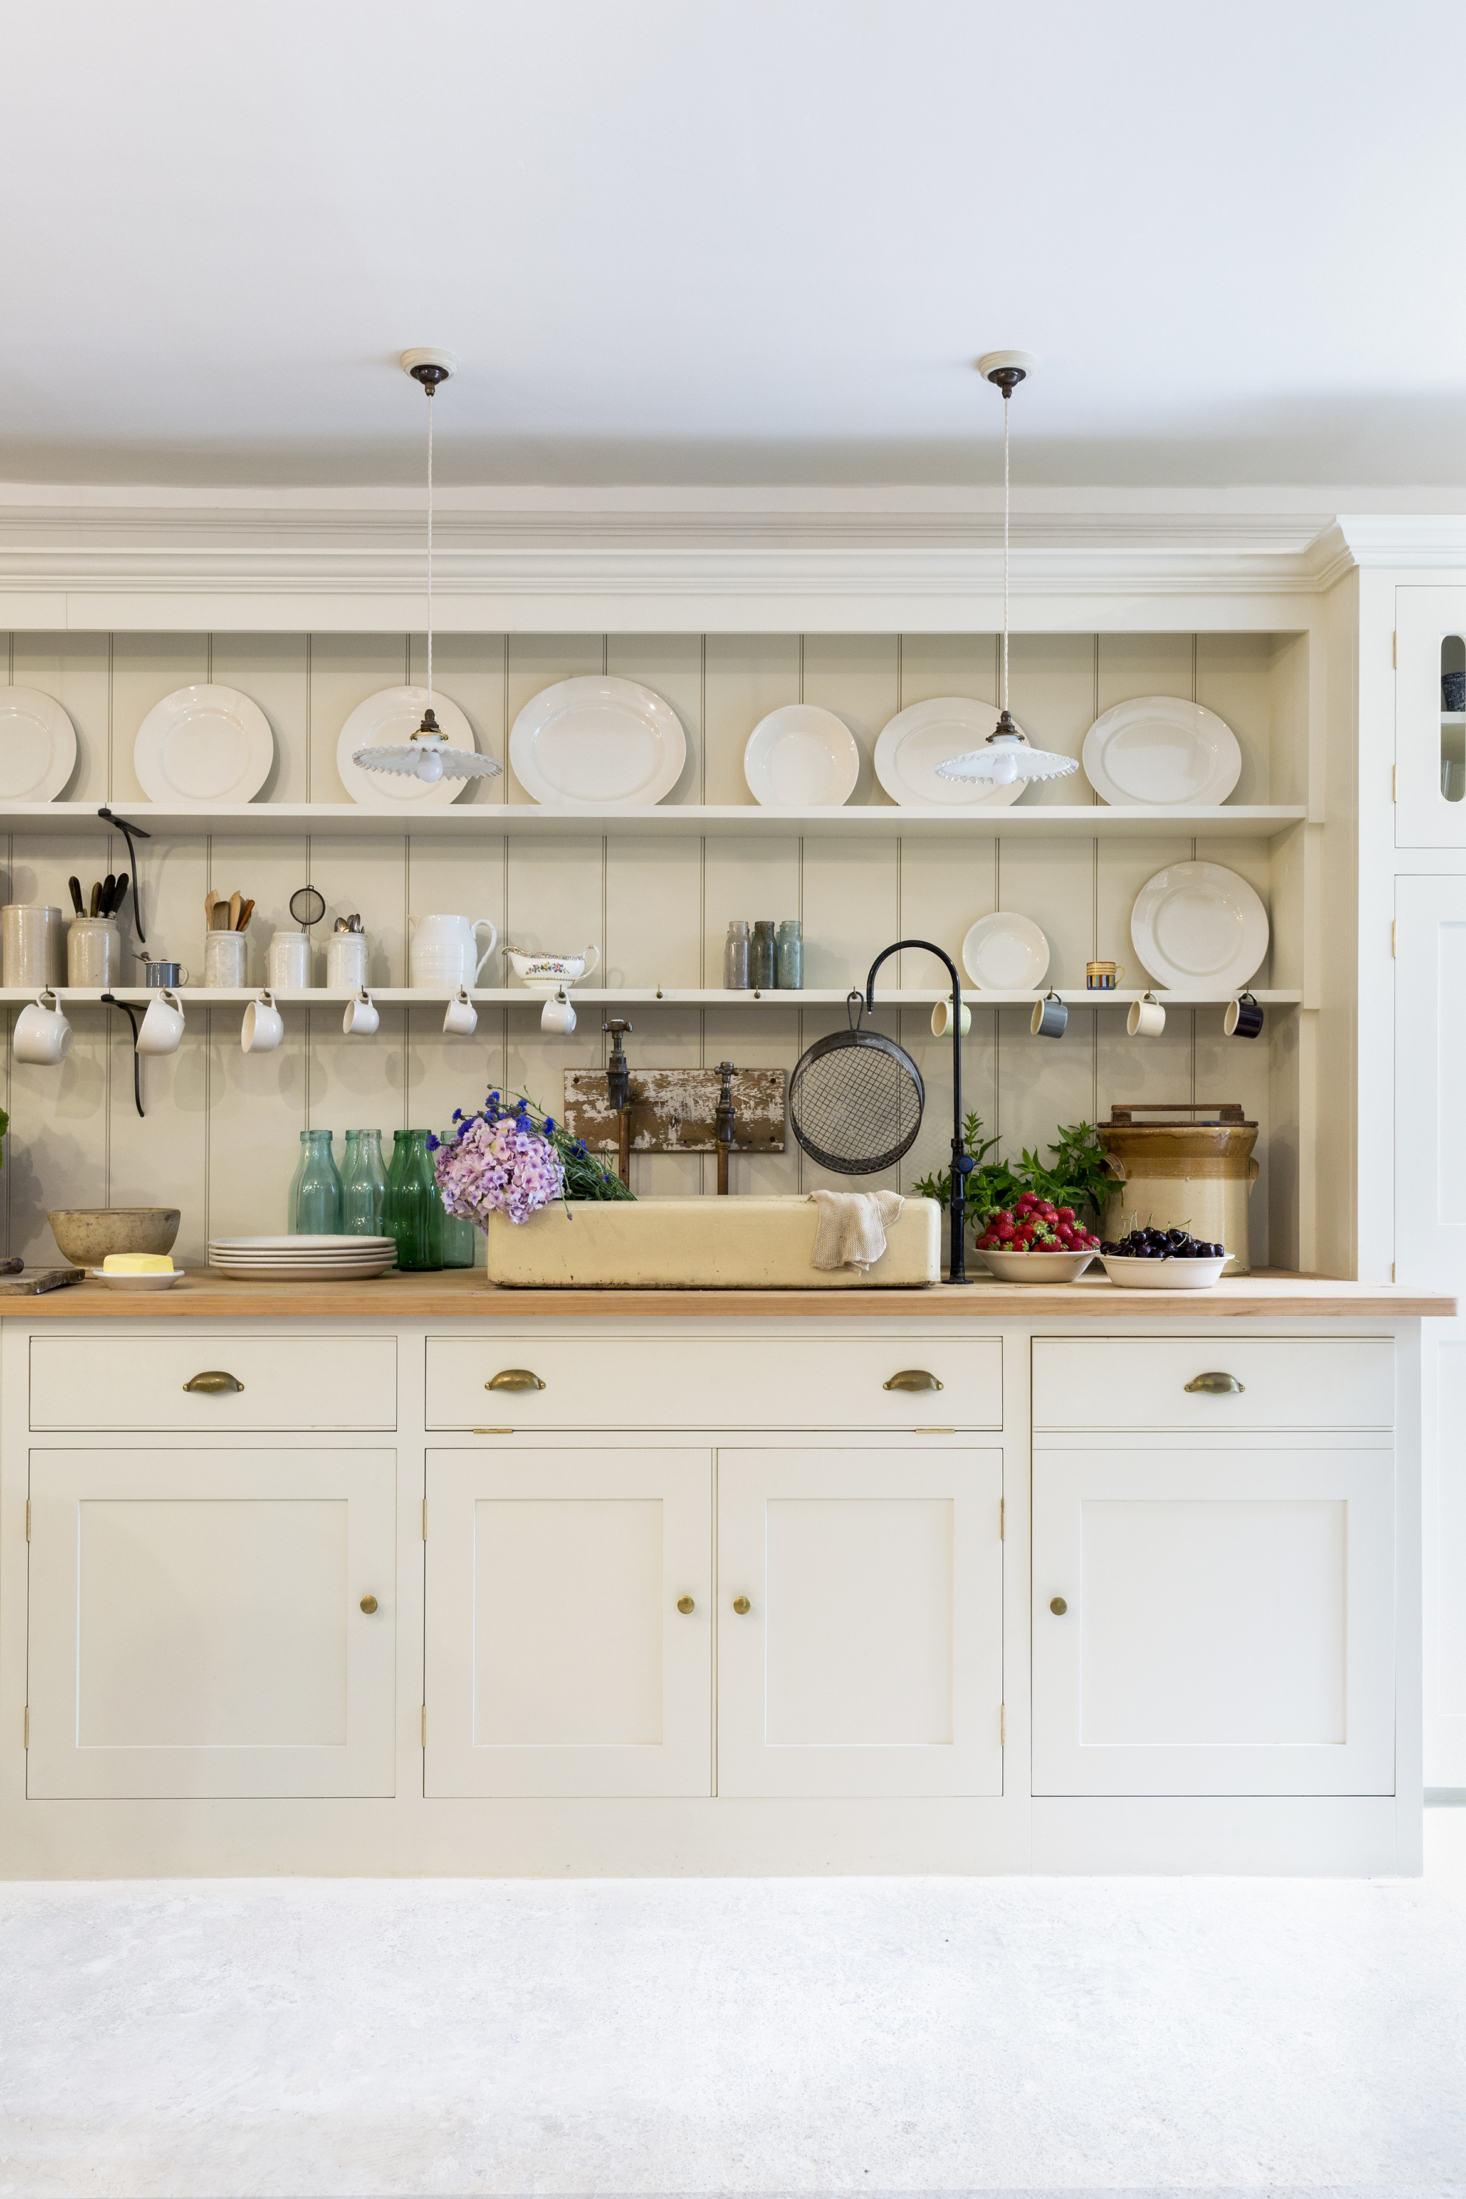 plain-english-kitchen-at-howe-london-3-1466x2199.jpg